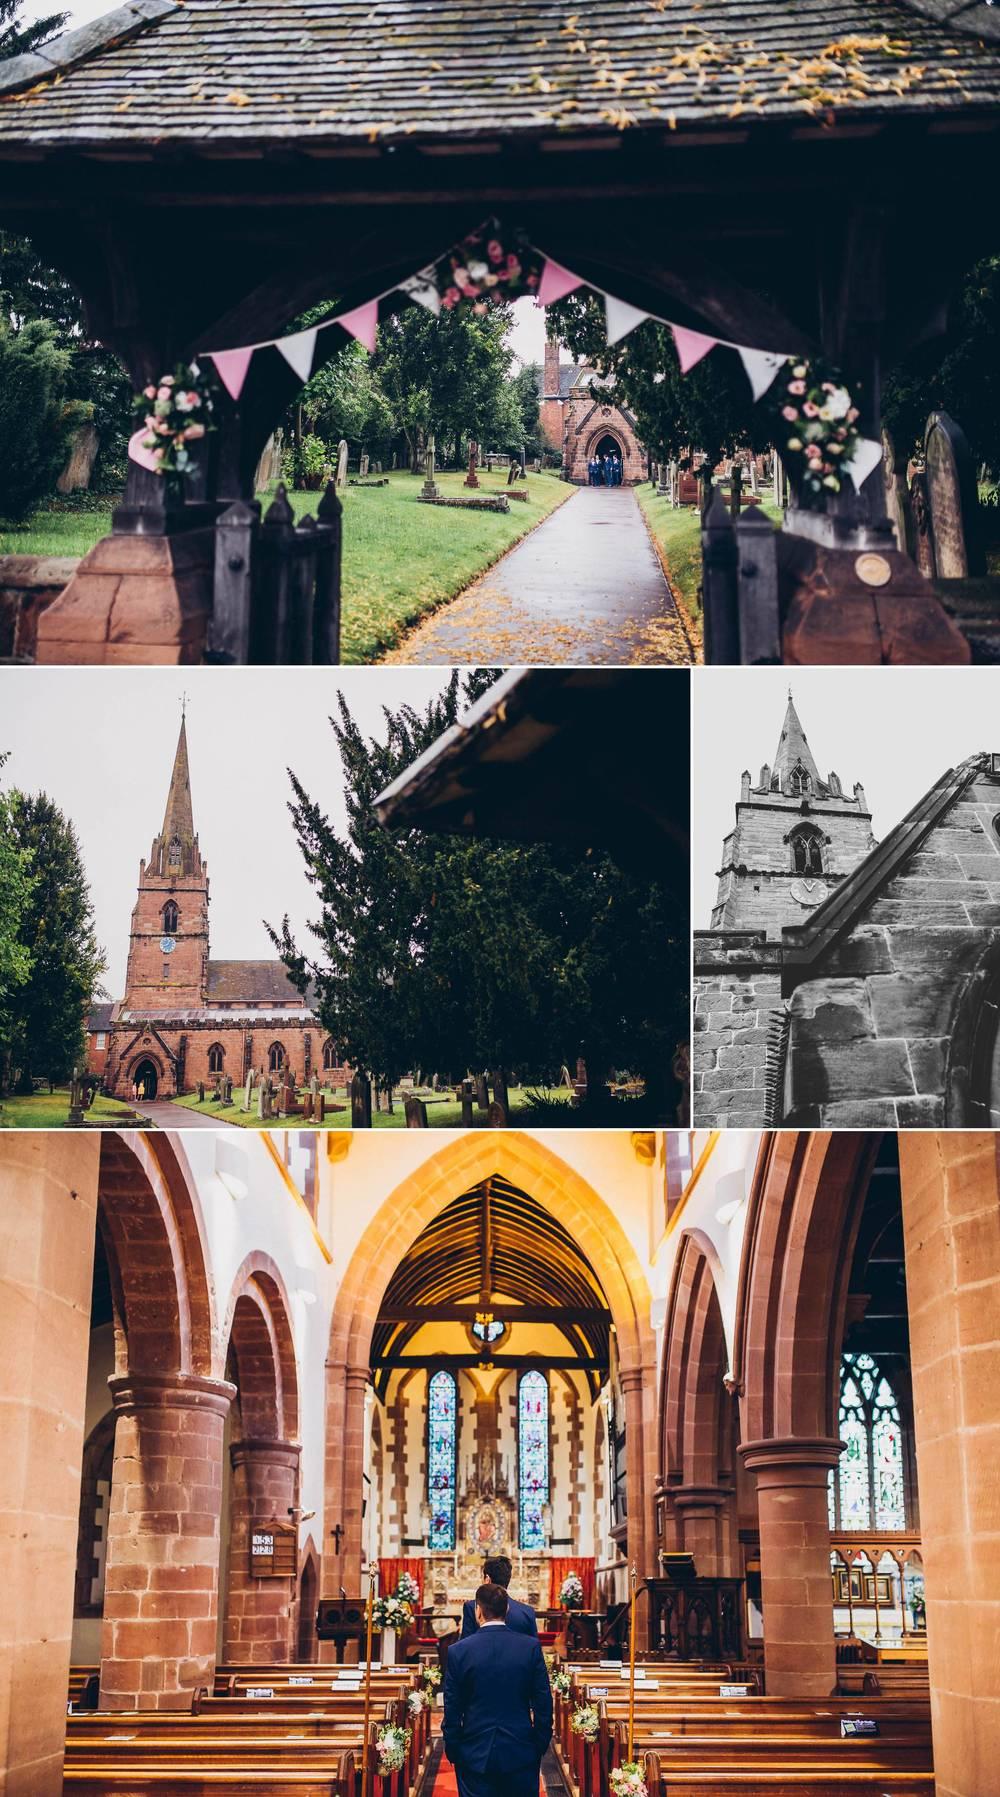 pendrell-hall-wedding-photography 2.jpg